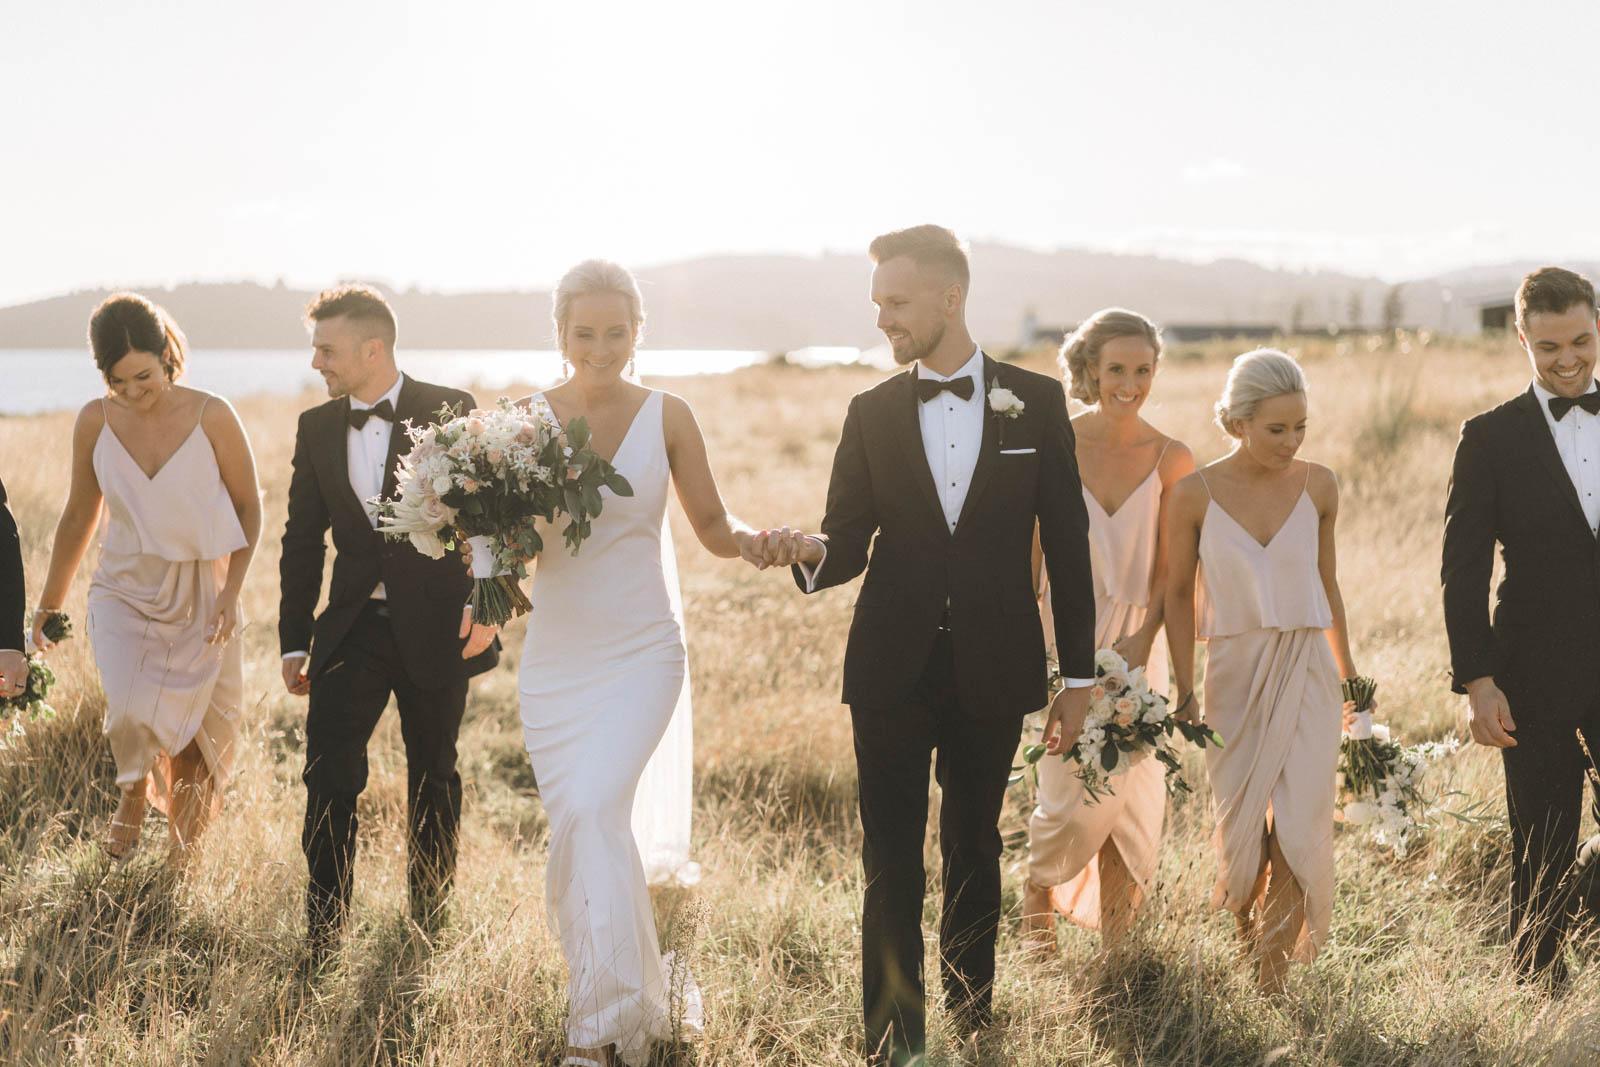 newfound-k-s-hilton-taupo-wedding-photographer-048